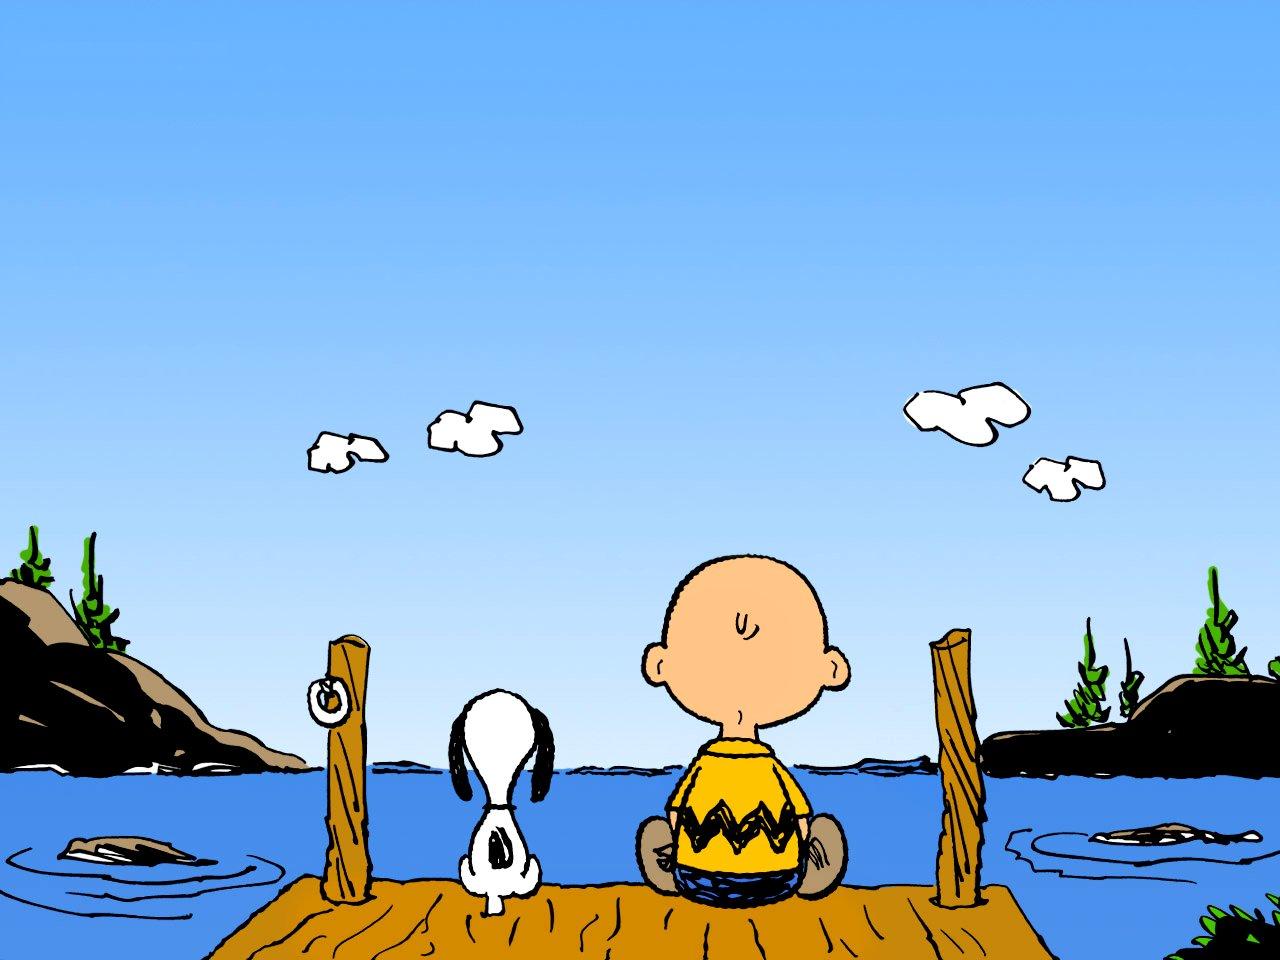 Charlie Brown Wallpaper 14844 1280x960 px HDWallSourcecom 1280x960